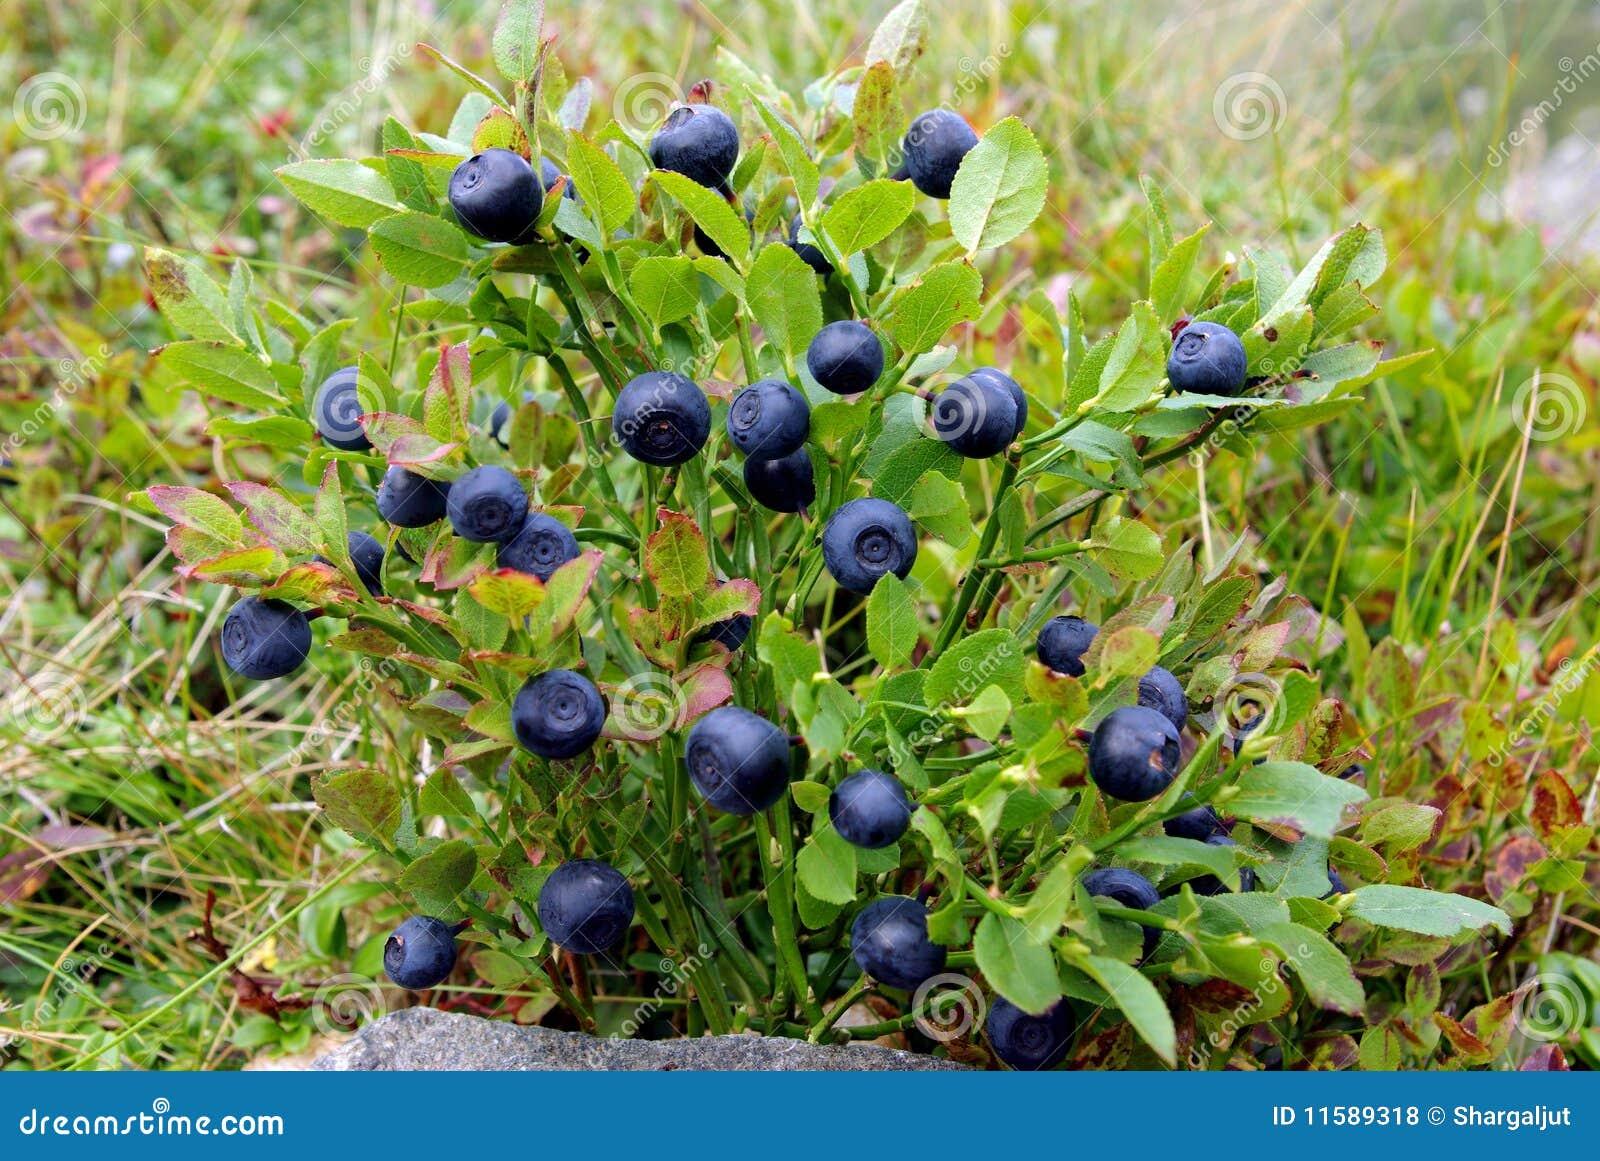 Blueberry Bush Stock Photo Image Of Healthfull Mountain